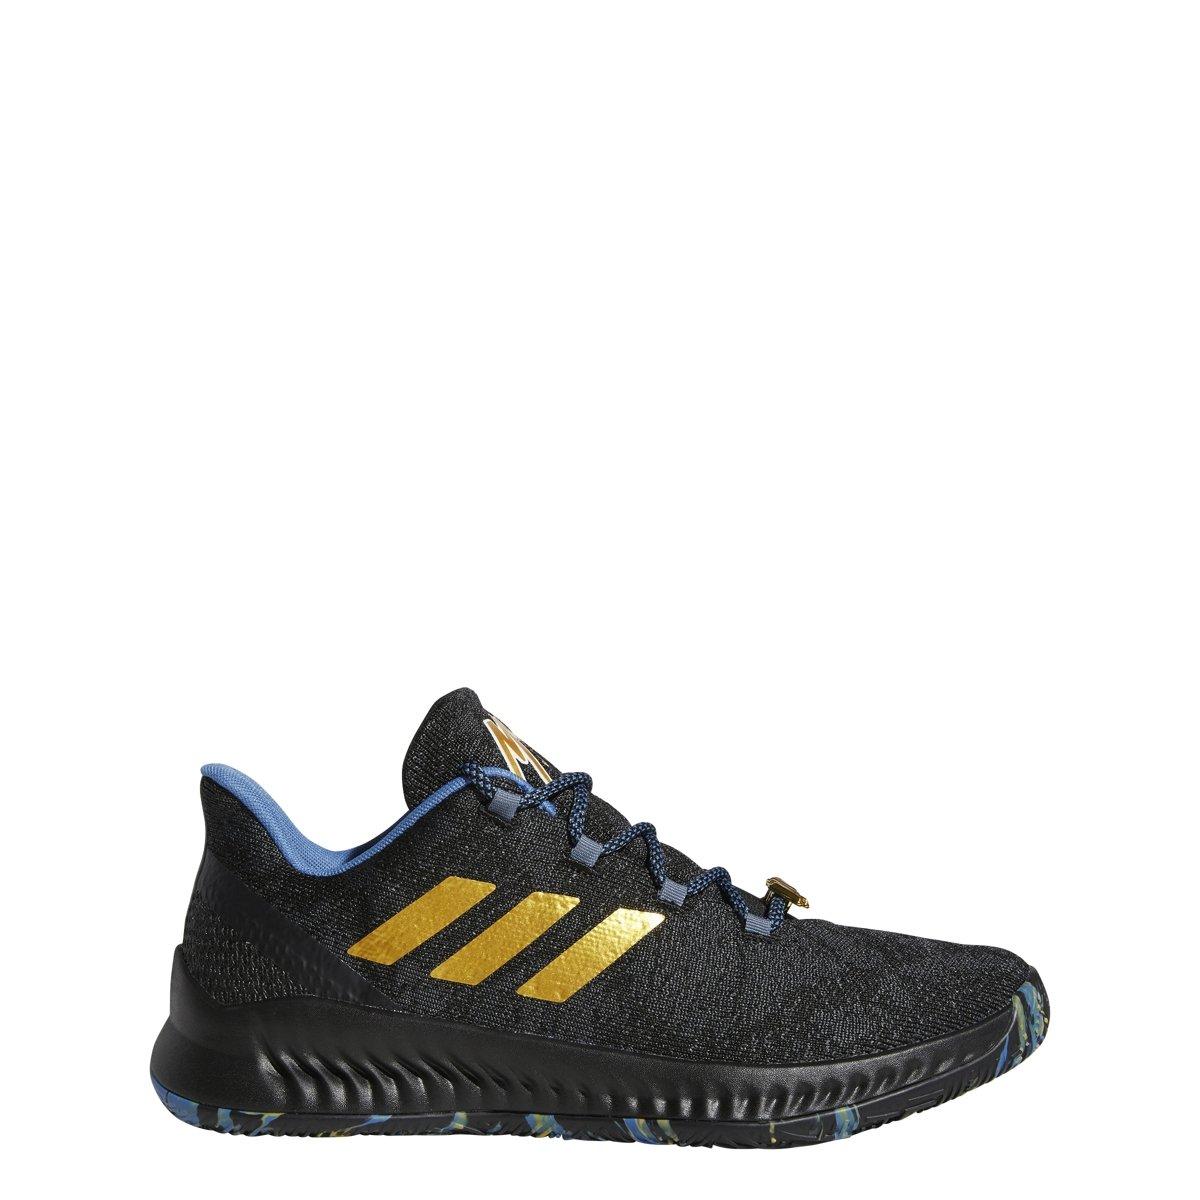 homme / femme est adidas harden b / e x - mvp chaussure de basket - x ball masculin l'esthétique online exportation magasin aw15312 antidérapant 02406b